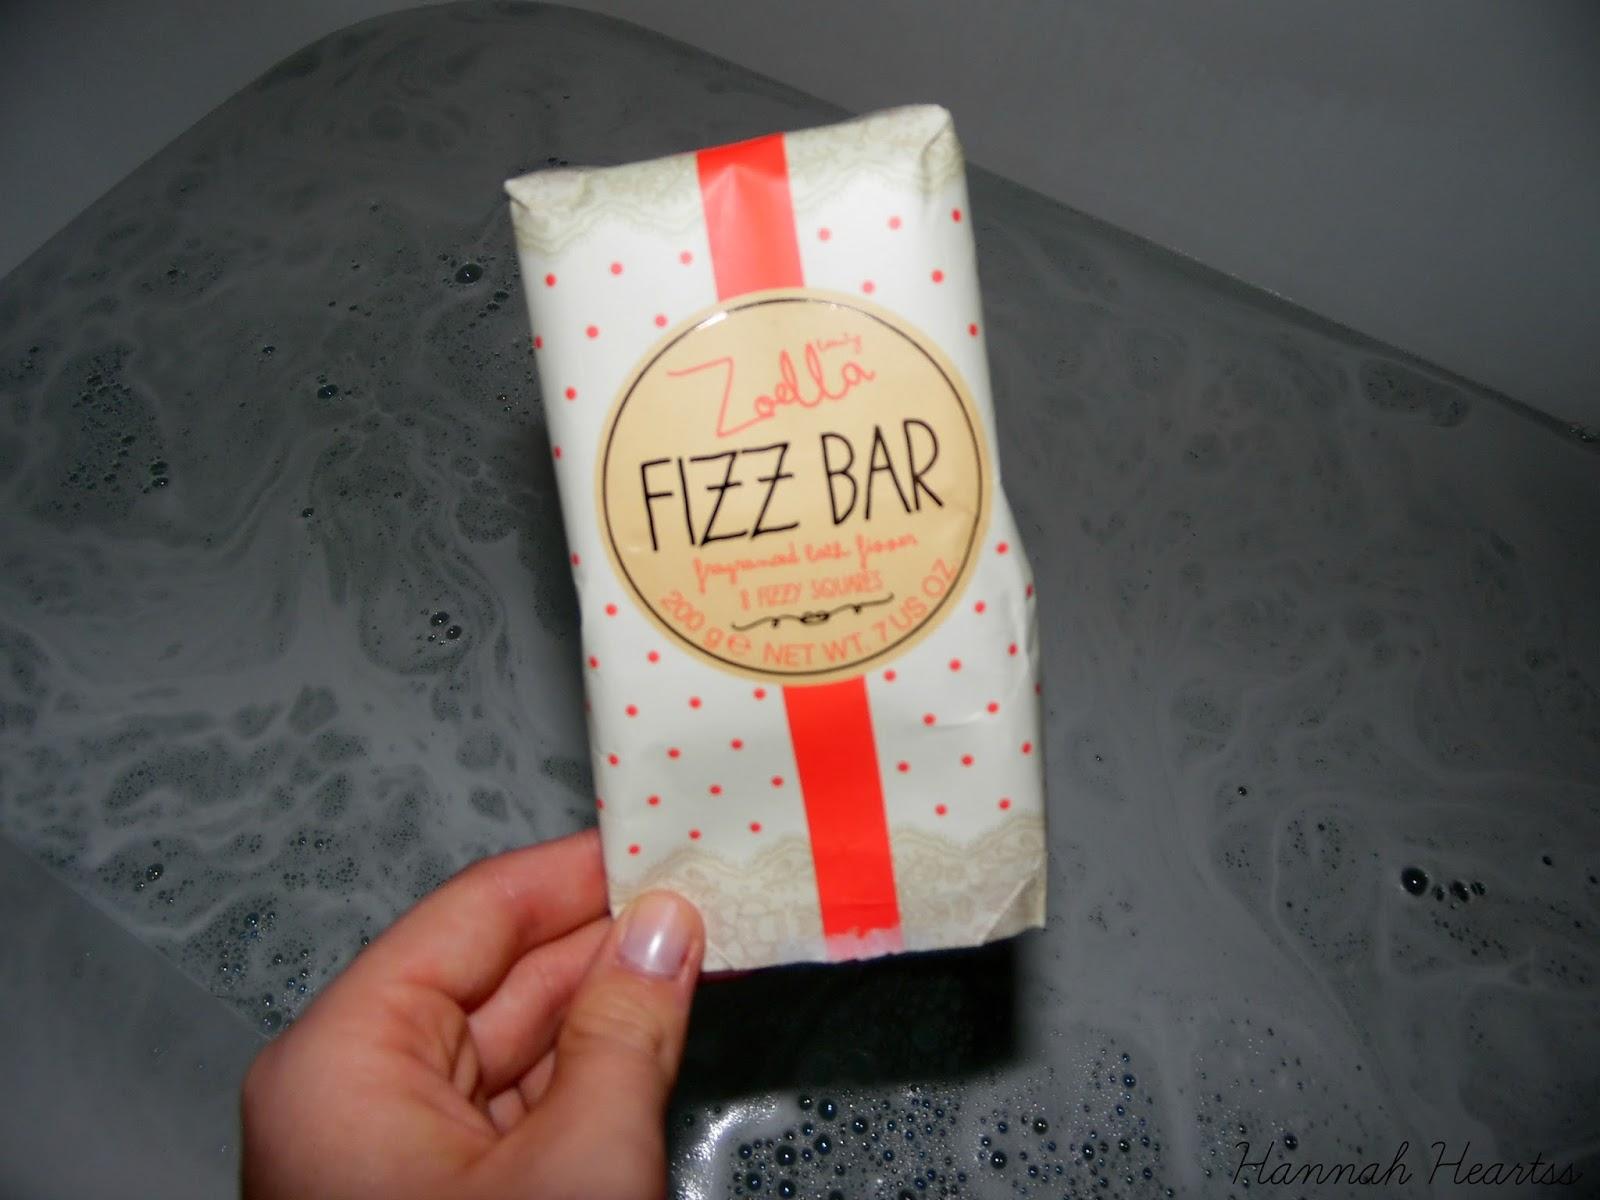 Zoella Fizz Bar